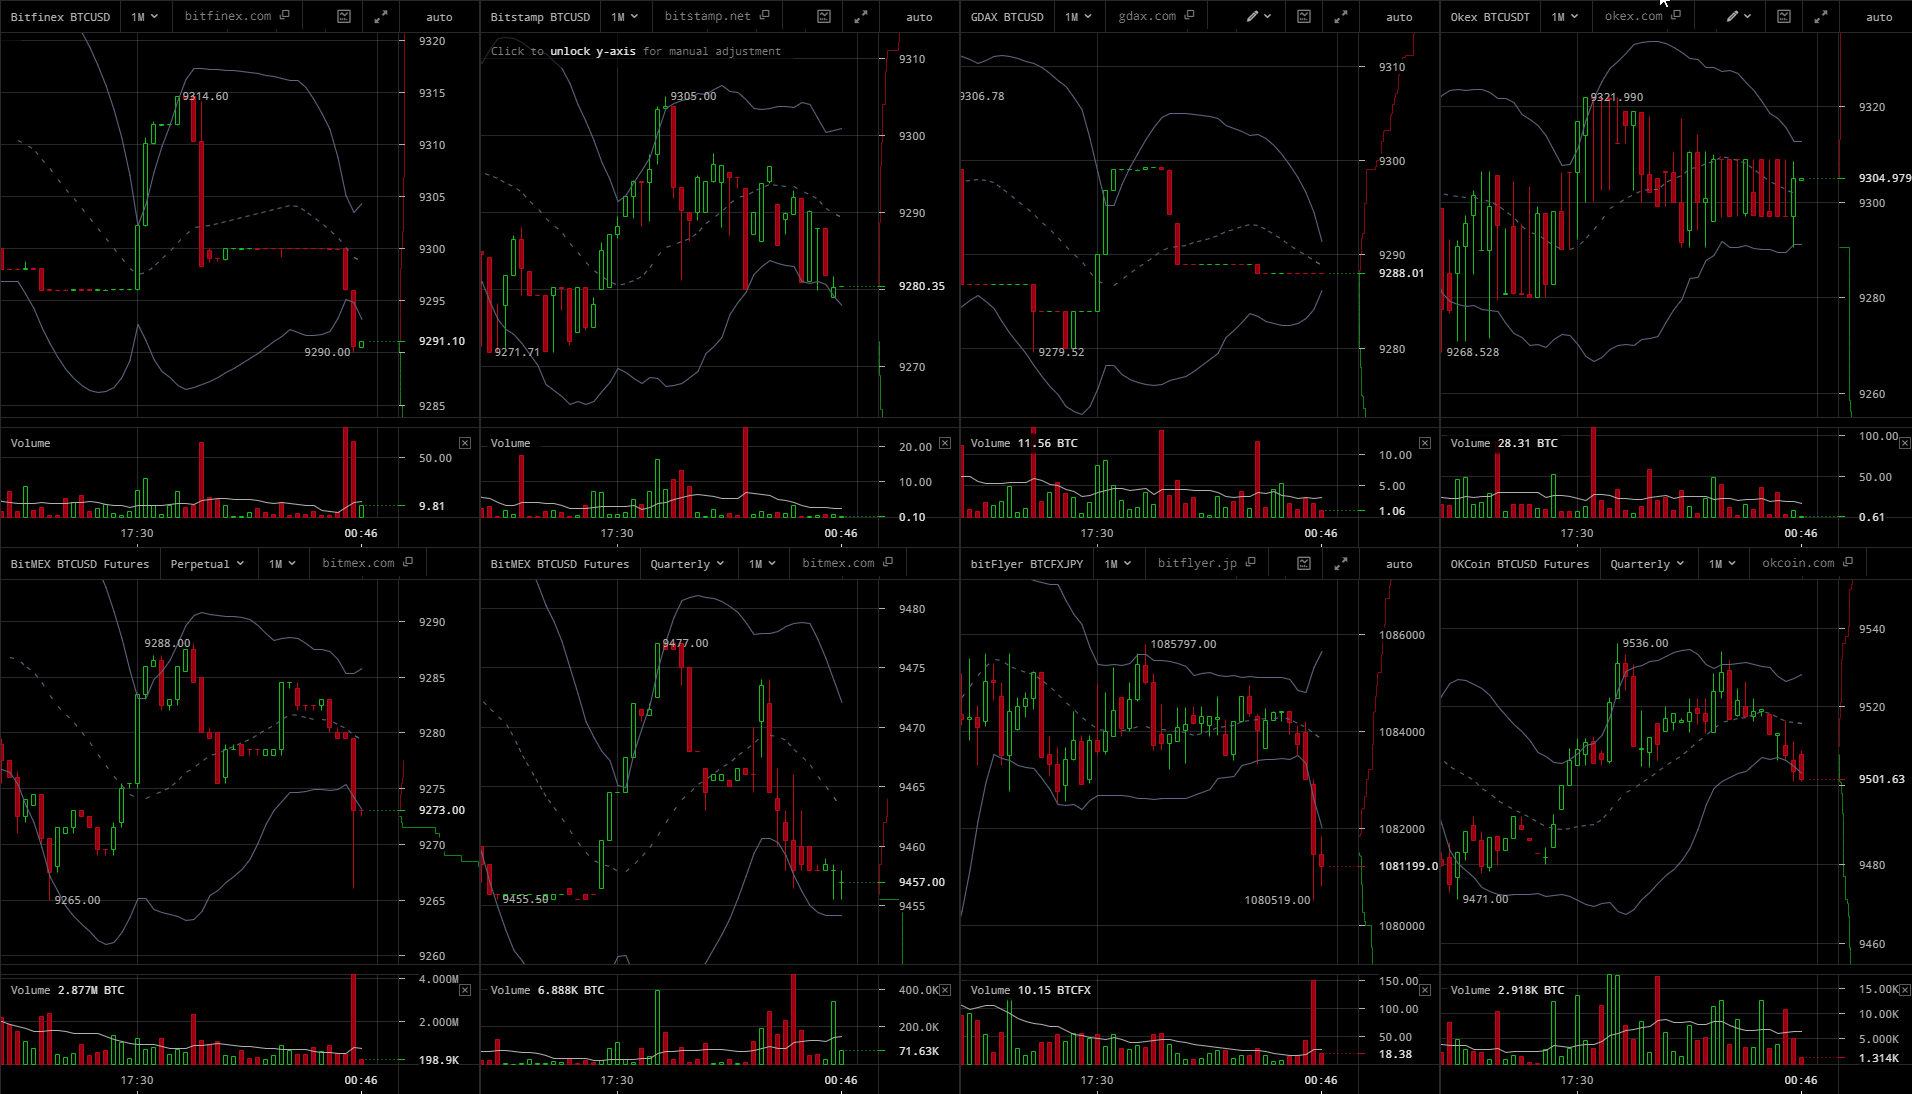 cryptowatch diagramos